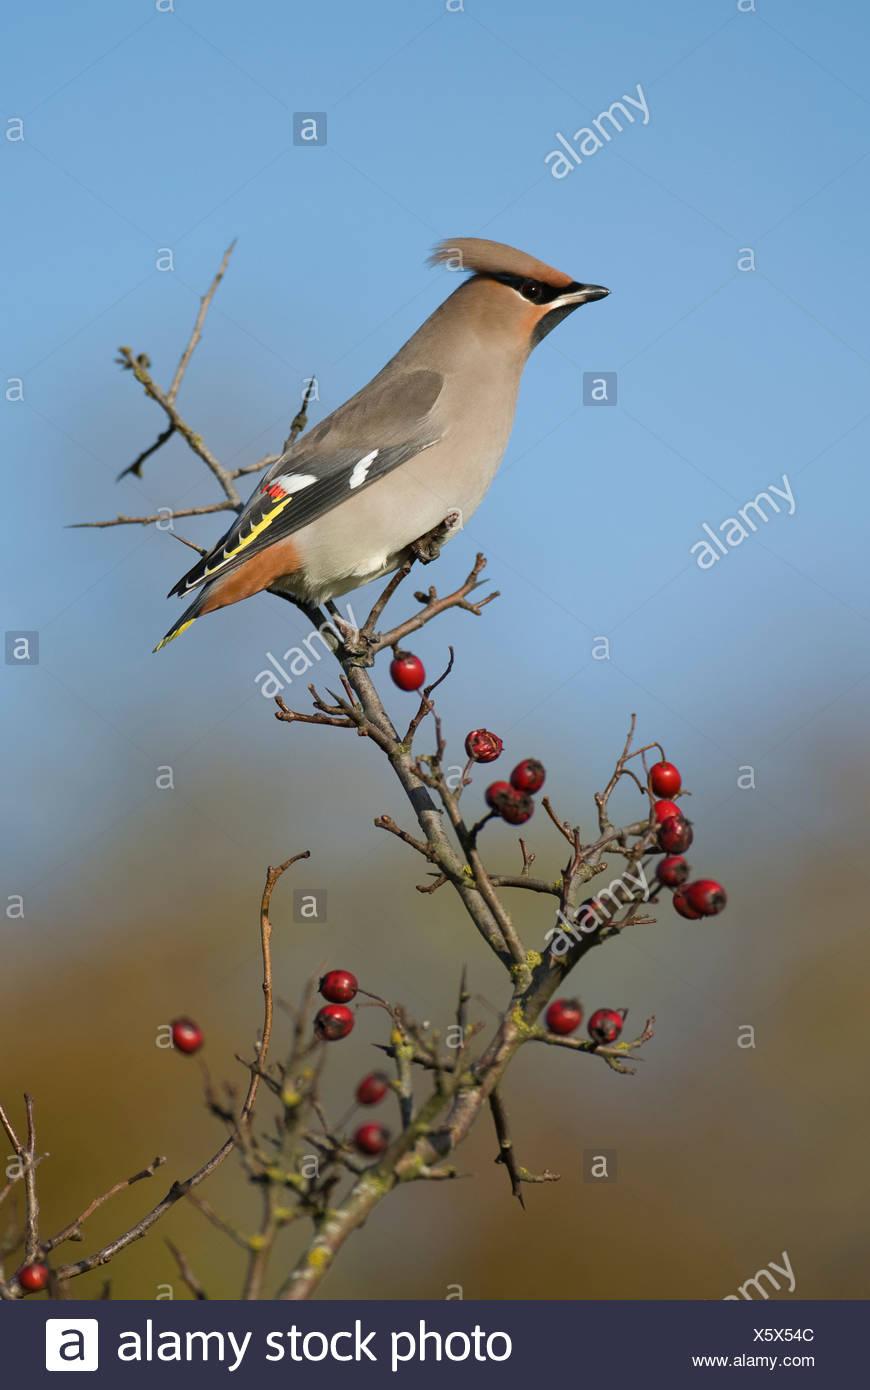 Scandinavia, Sweden, Oland, Waxwing bird perching on branch, close-up - Stock Image